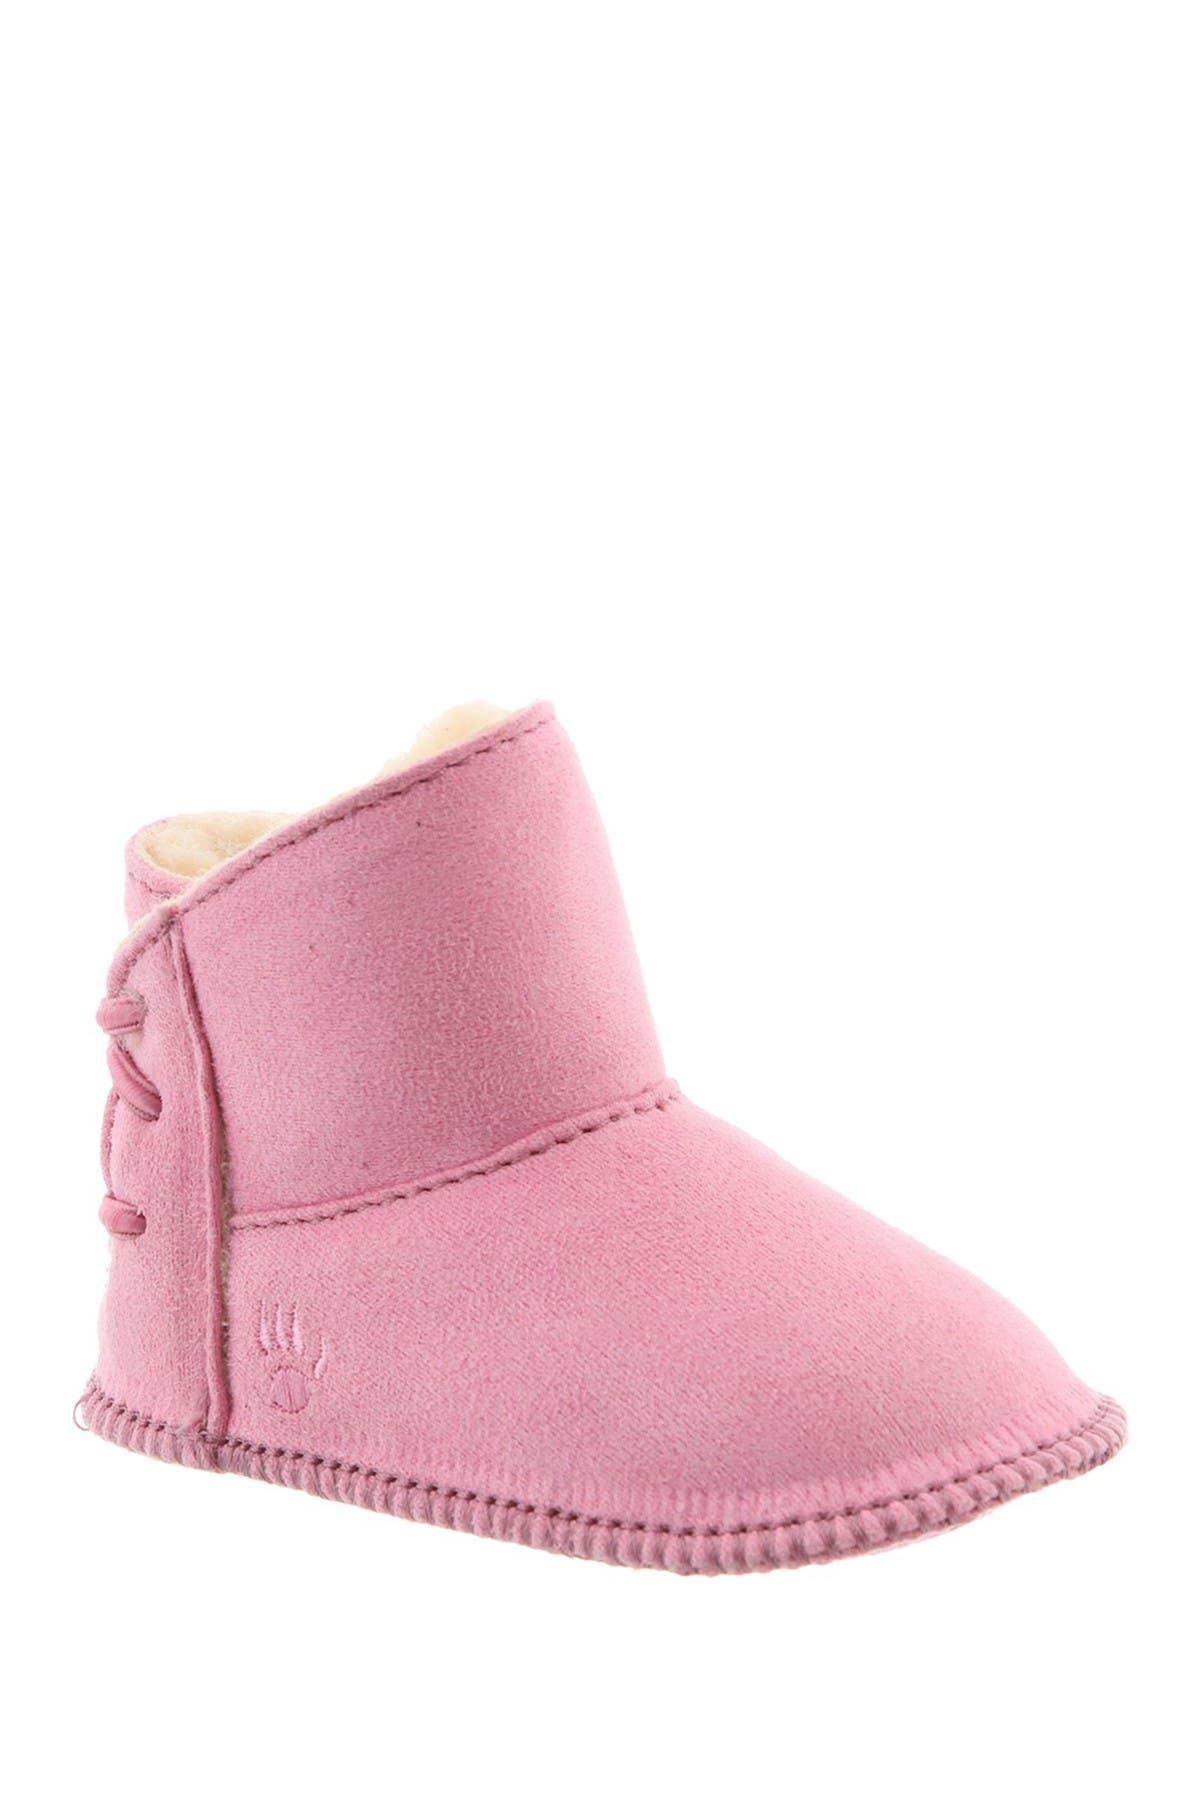 Image of BEARPAW Kaylee Genuine Shearling Lined Boot